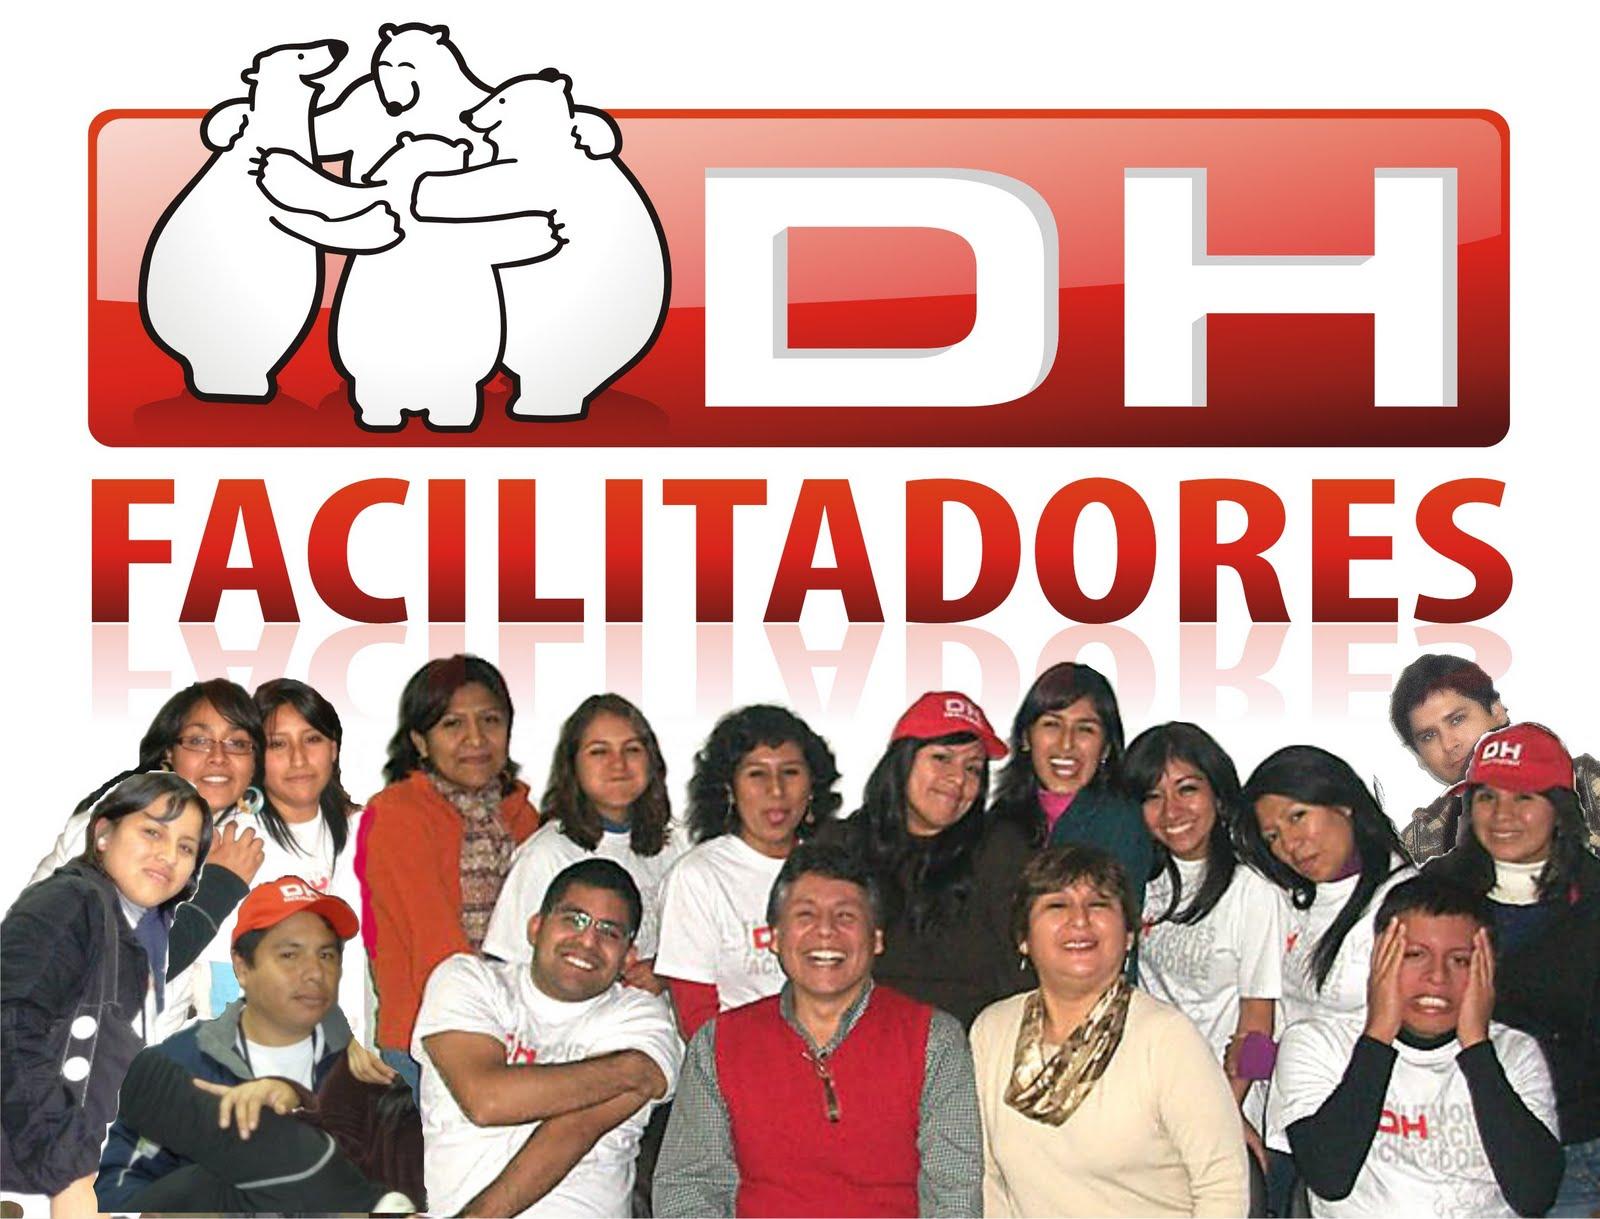 http://2.bp.blogspot.com/_ZhIZKun409w/TE7whZH0SuI/AAAAAAAACc0/gF3vRsFPzw0/s1600/DH+VOLUNTARIOS+2010.jpg